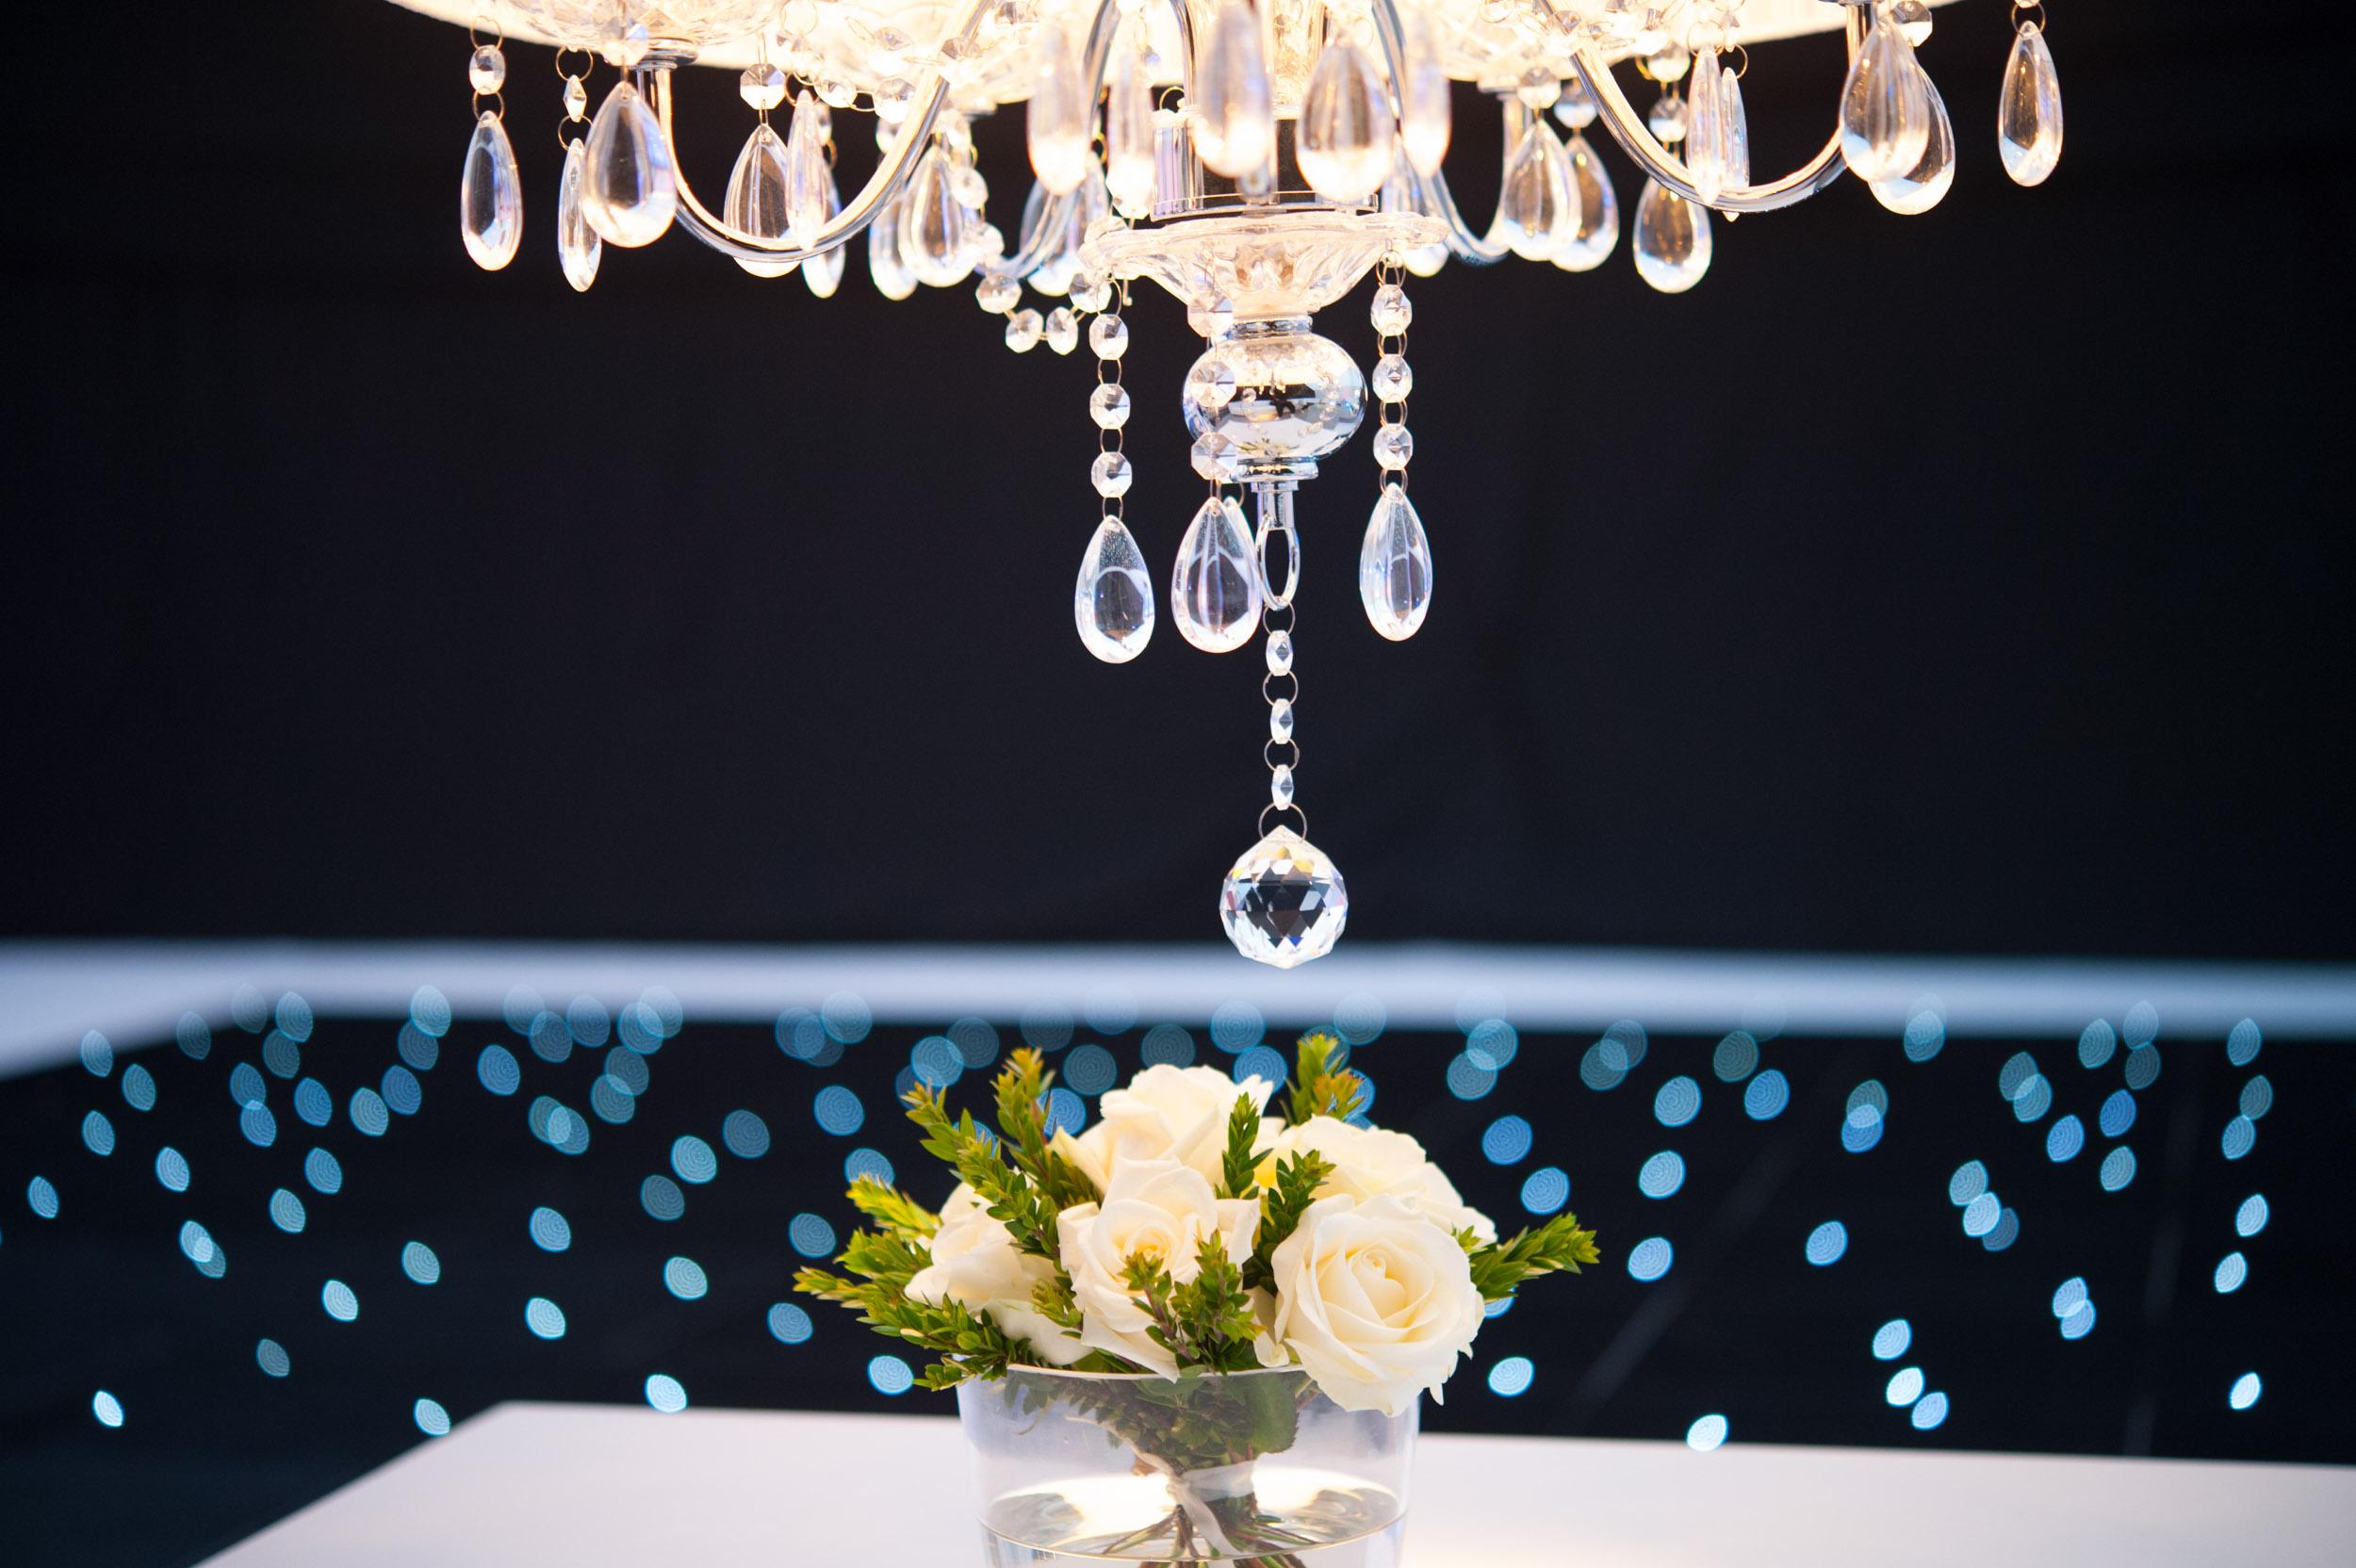 wedding-dance-floor-1.jpg